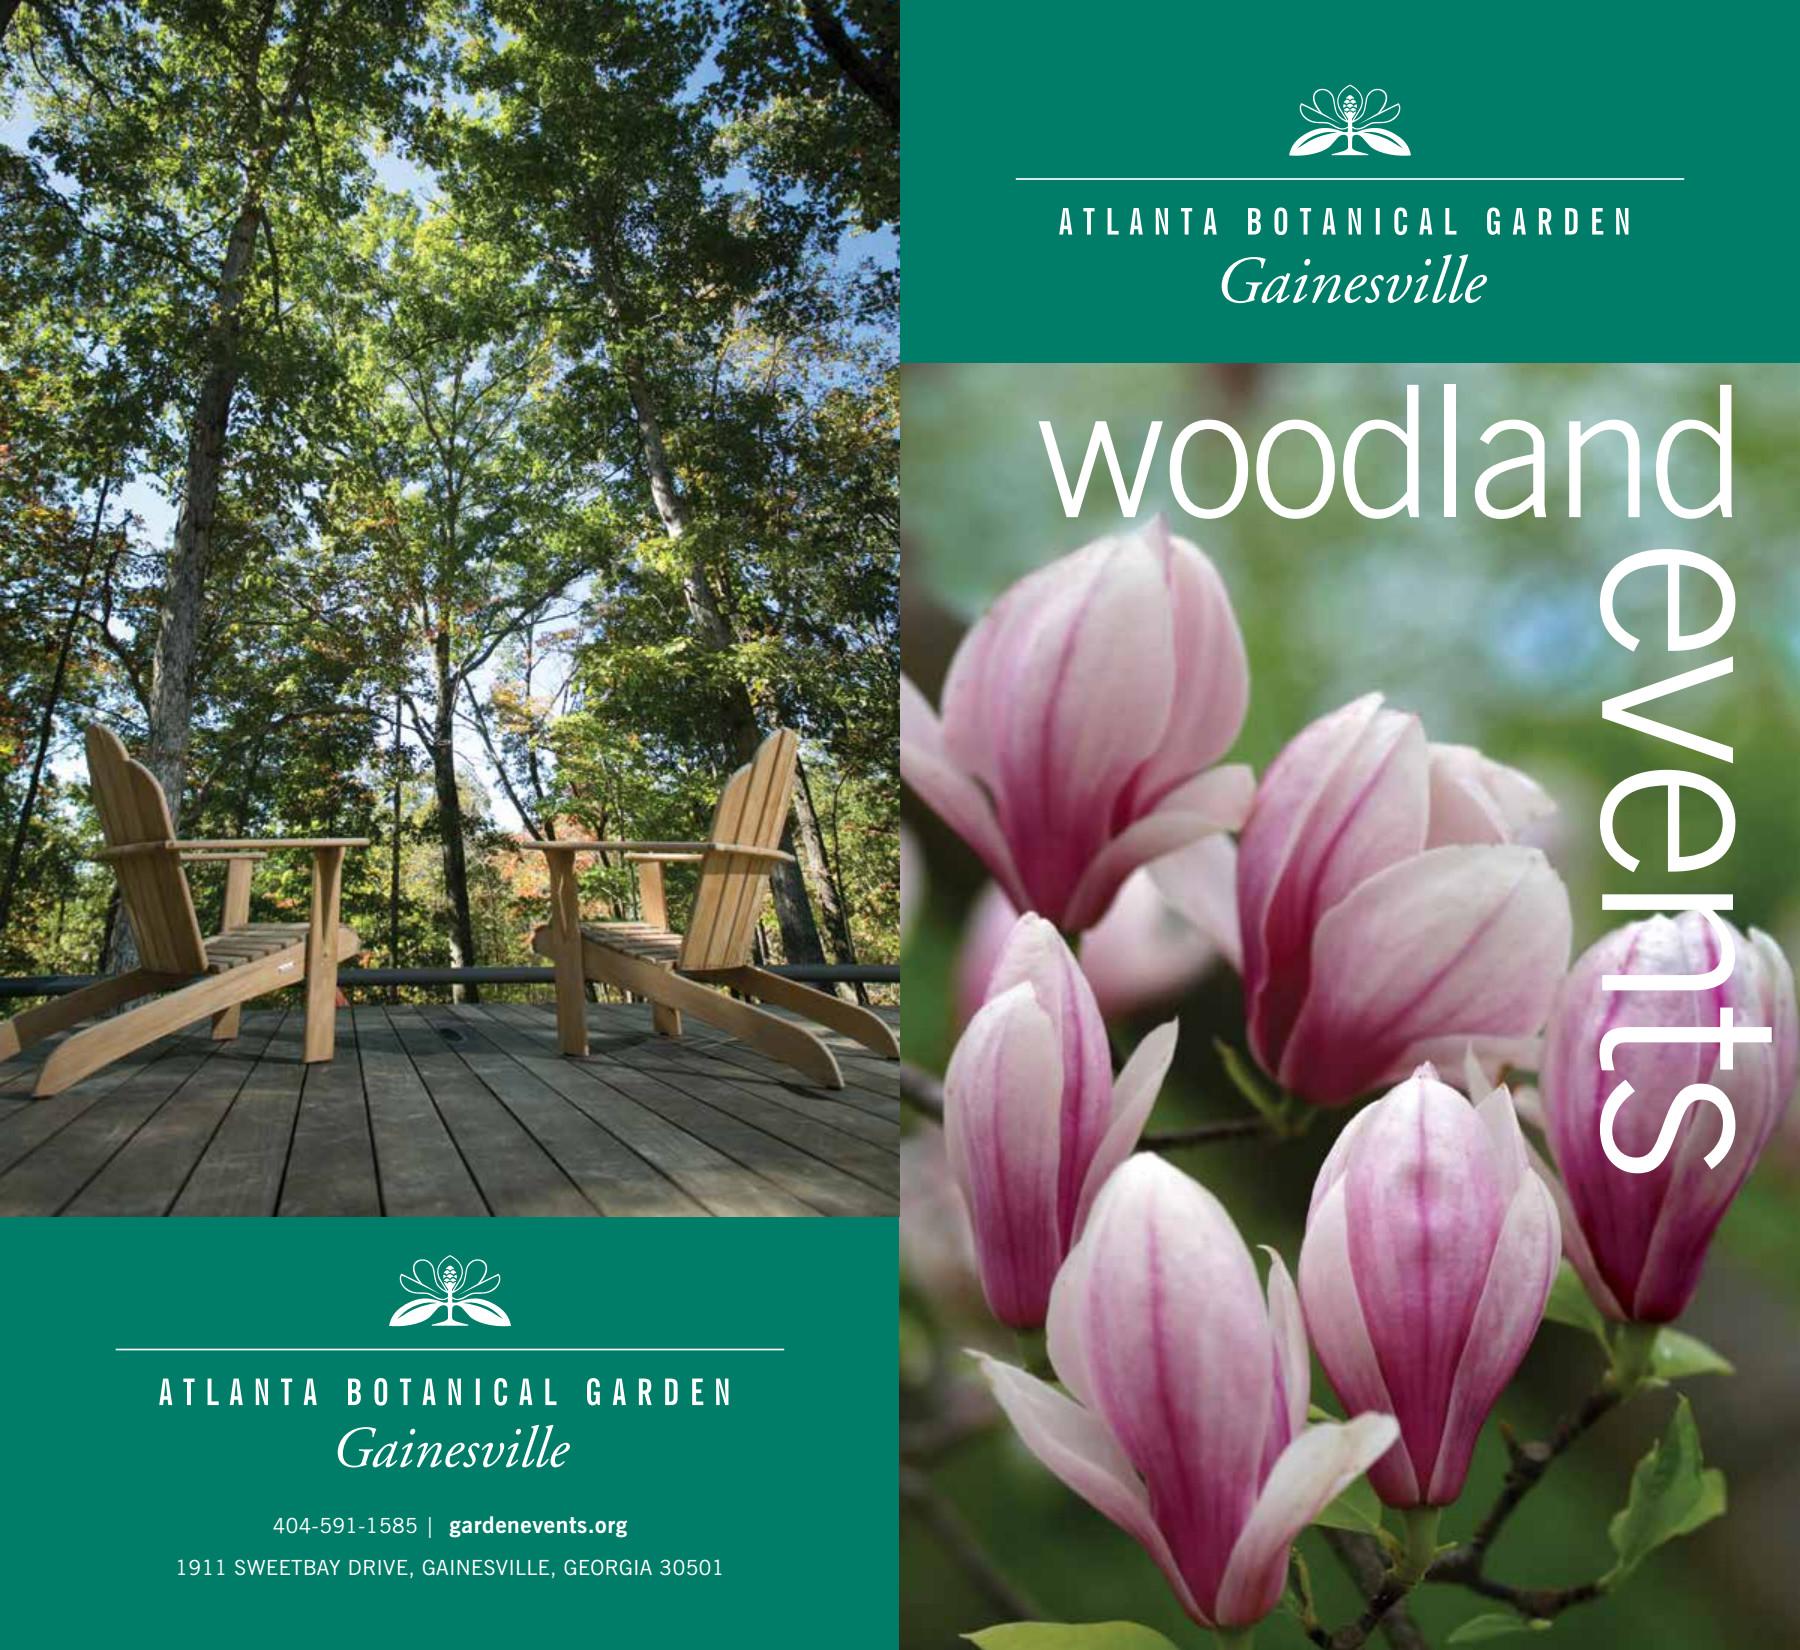 atlanta botanical garden gainesville private rentals brochure - Gainesville Botanical Garden